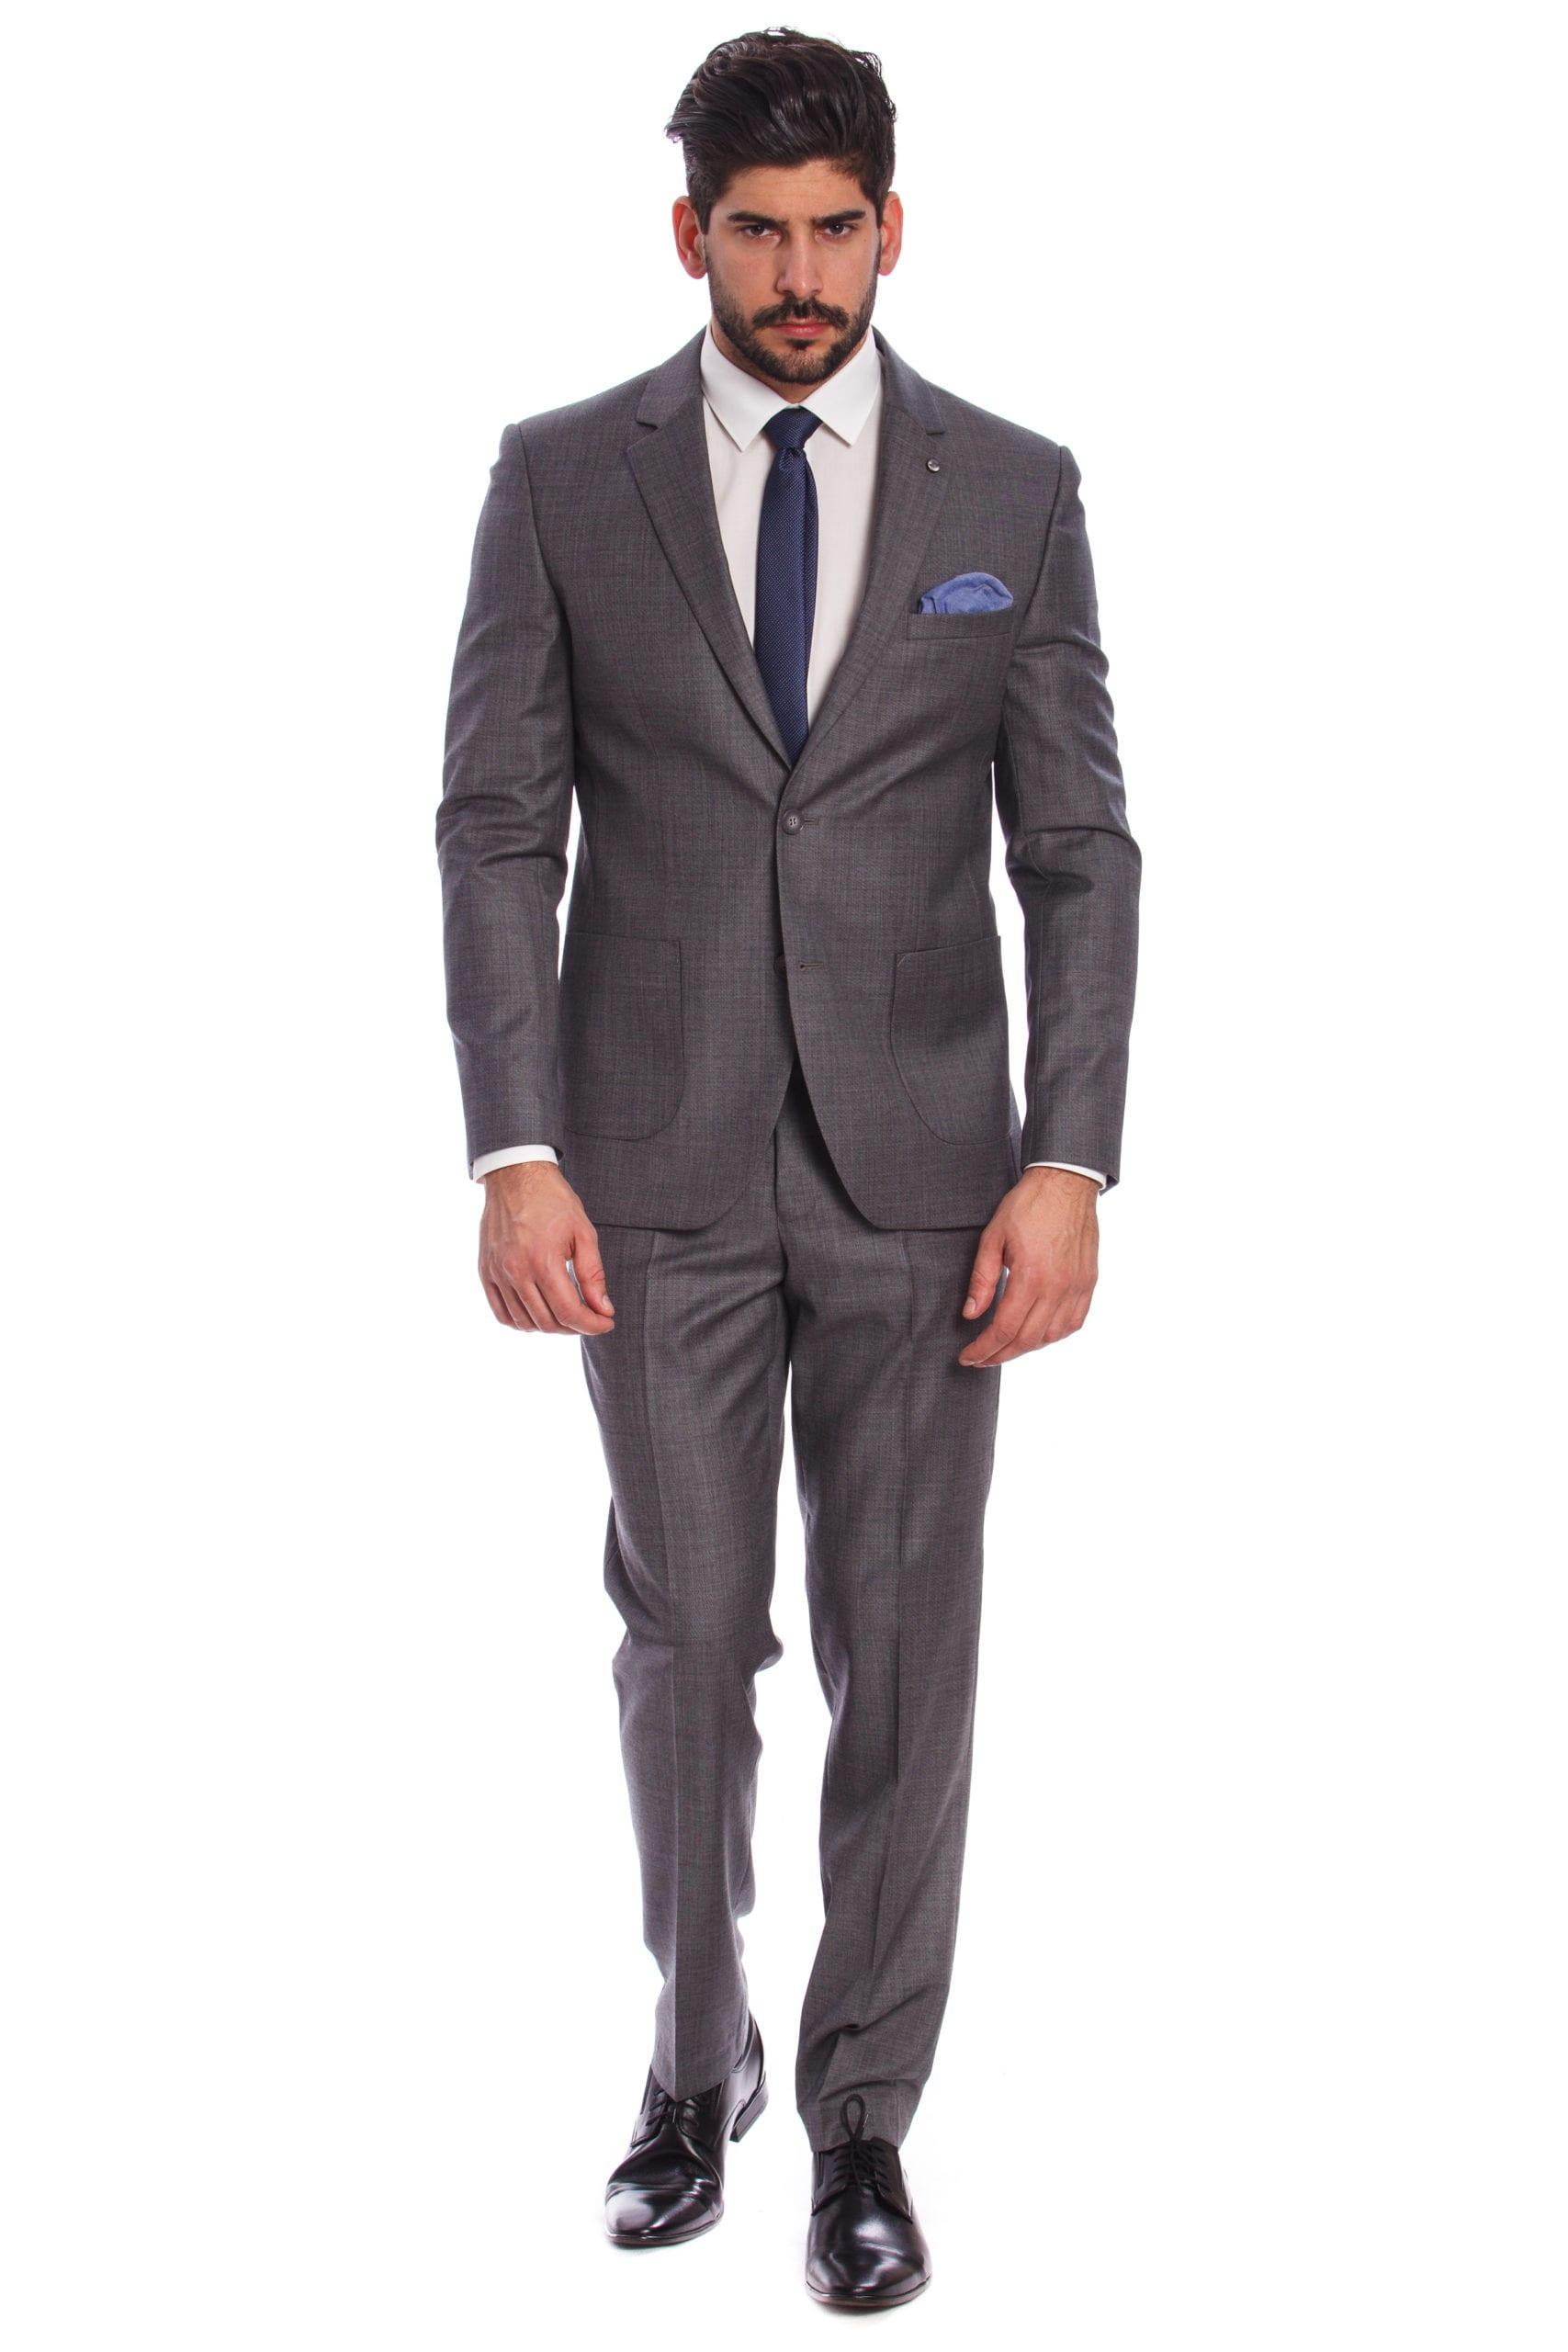 9cb1cc1480 Bergamo Világosszürke Slim Fit Gyapjú Öltöny - Elite Fashion Öltönyház